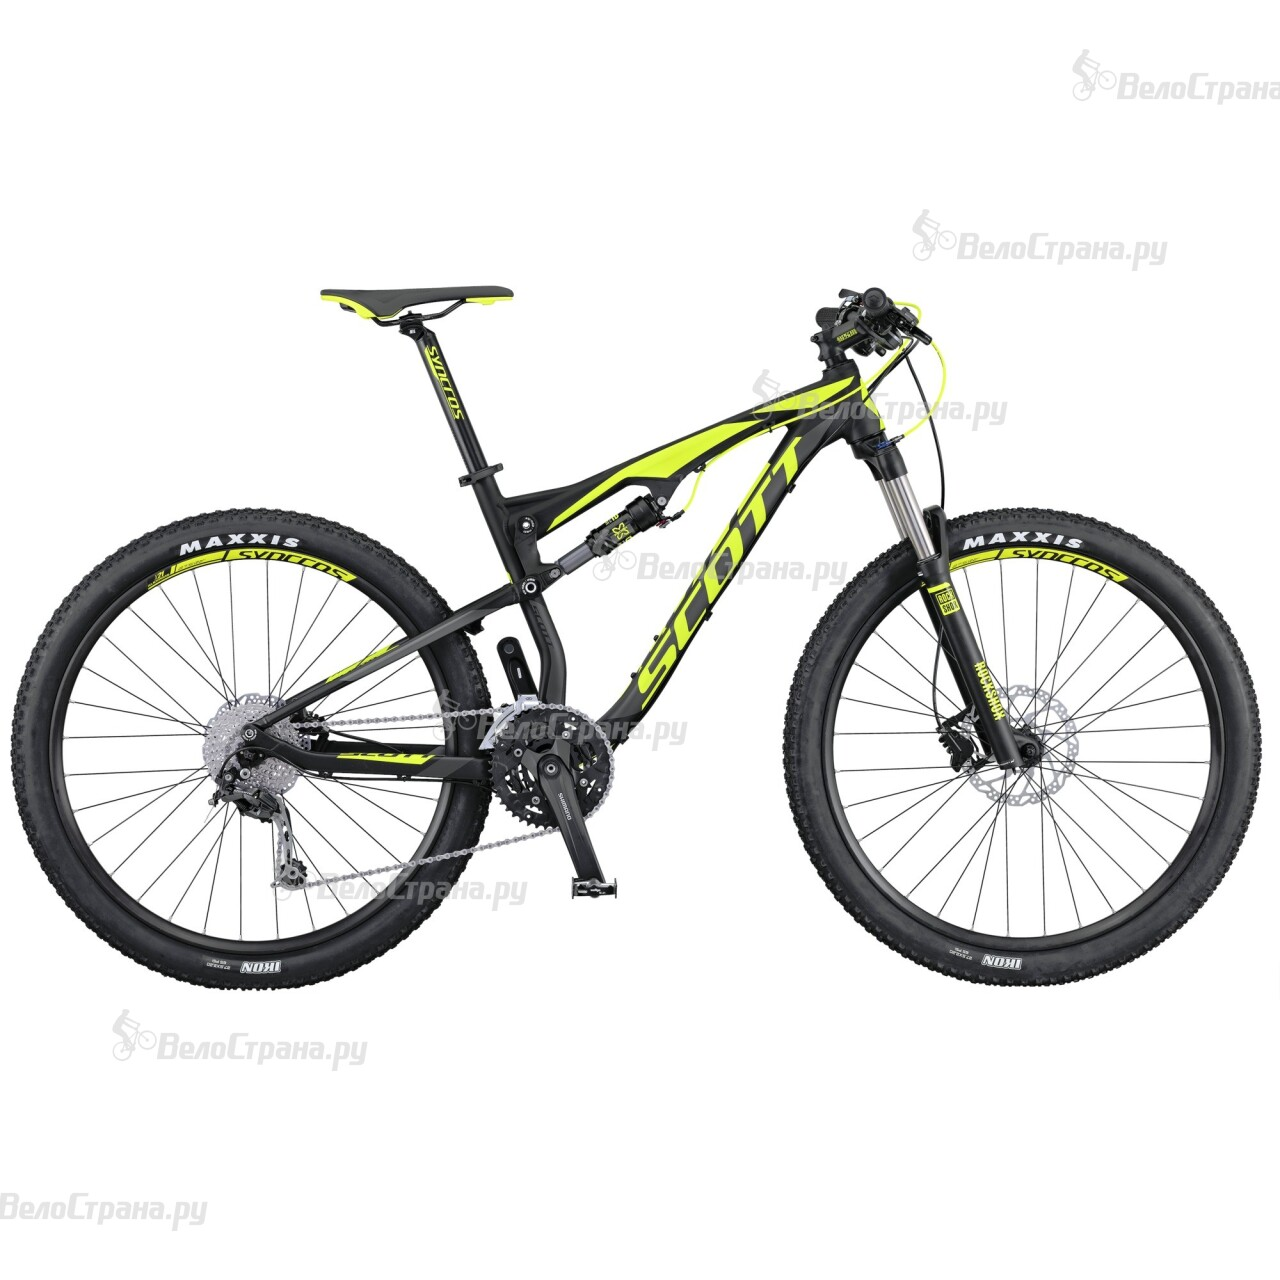 Велосипед Scott Spark 960 (2016) scott spark 750 2017